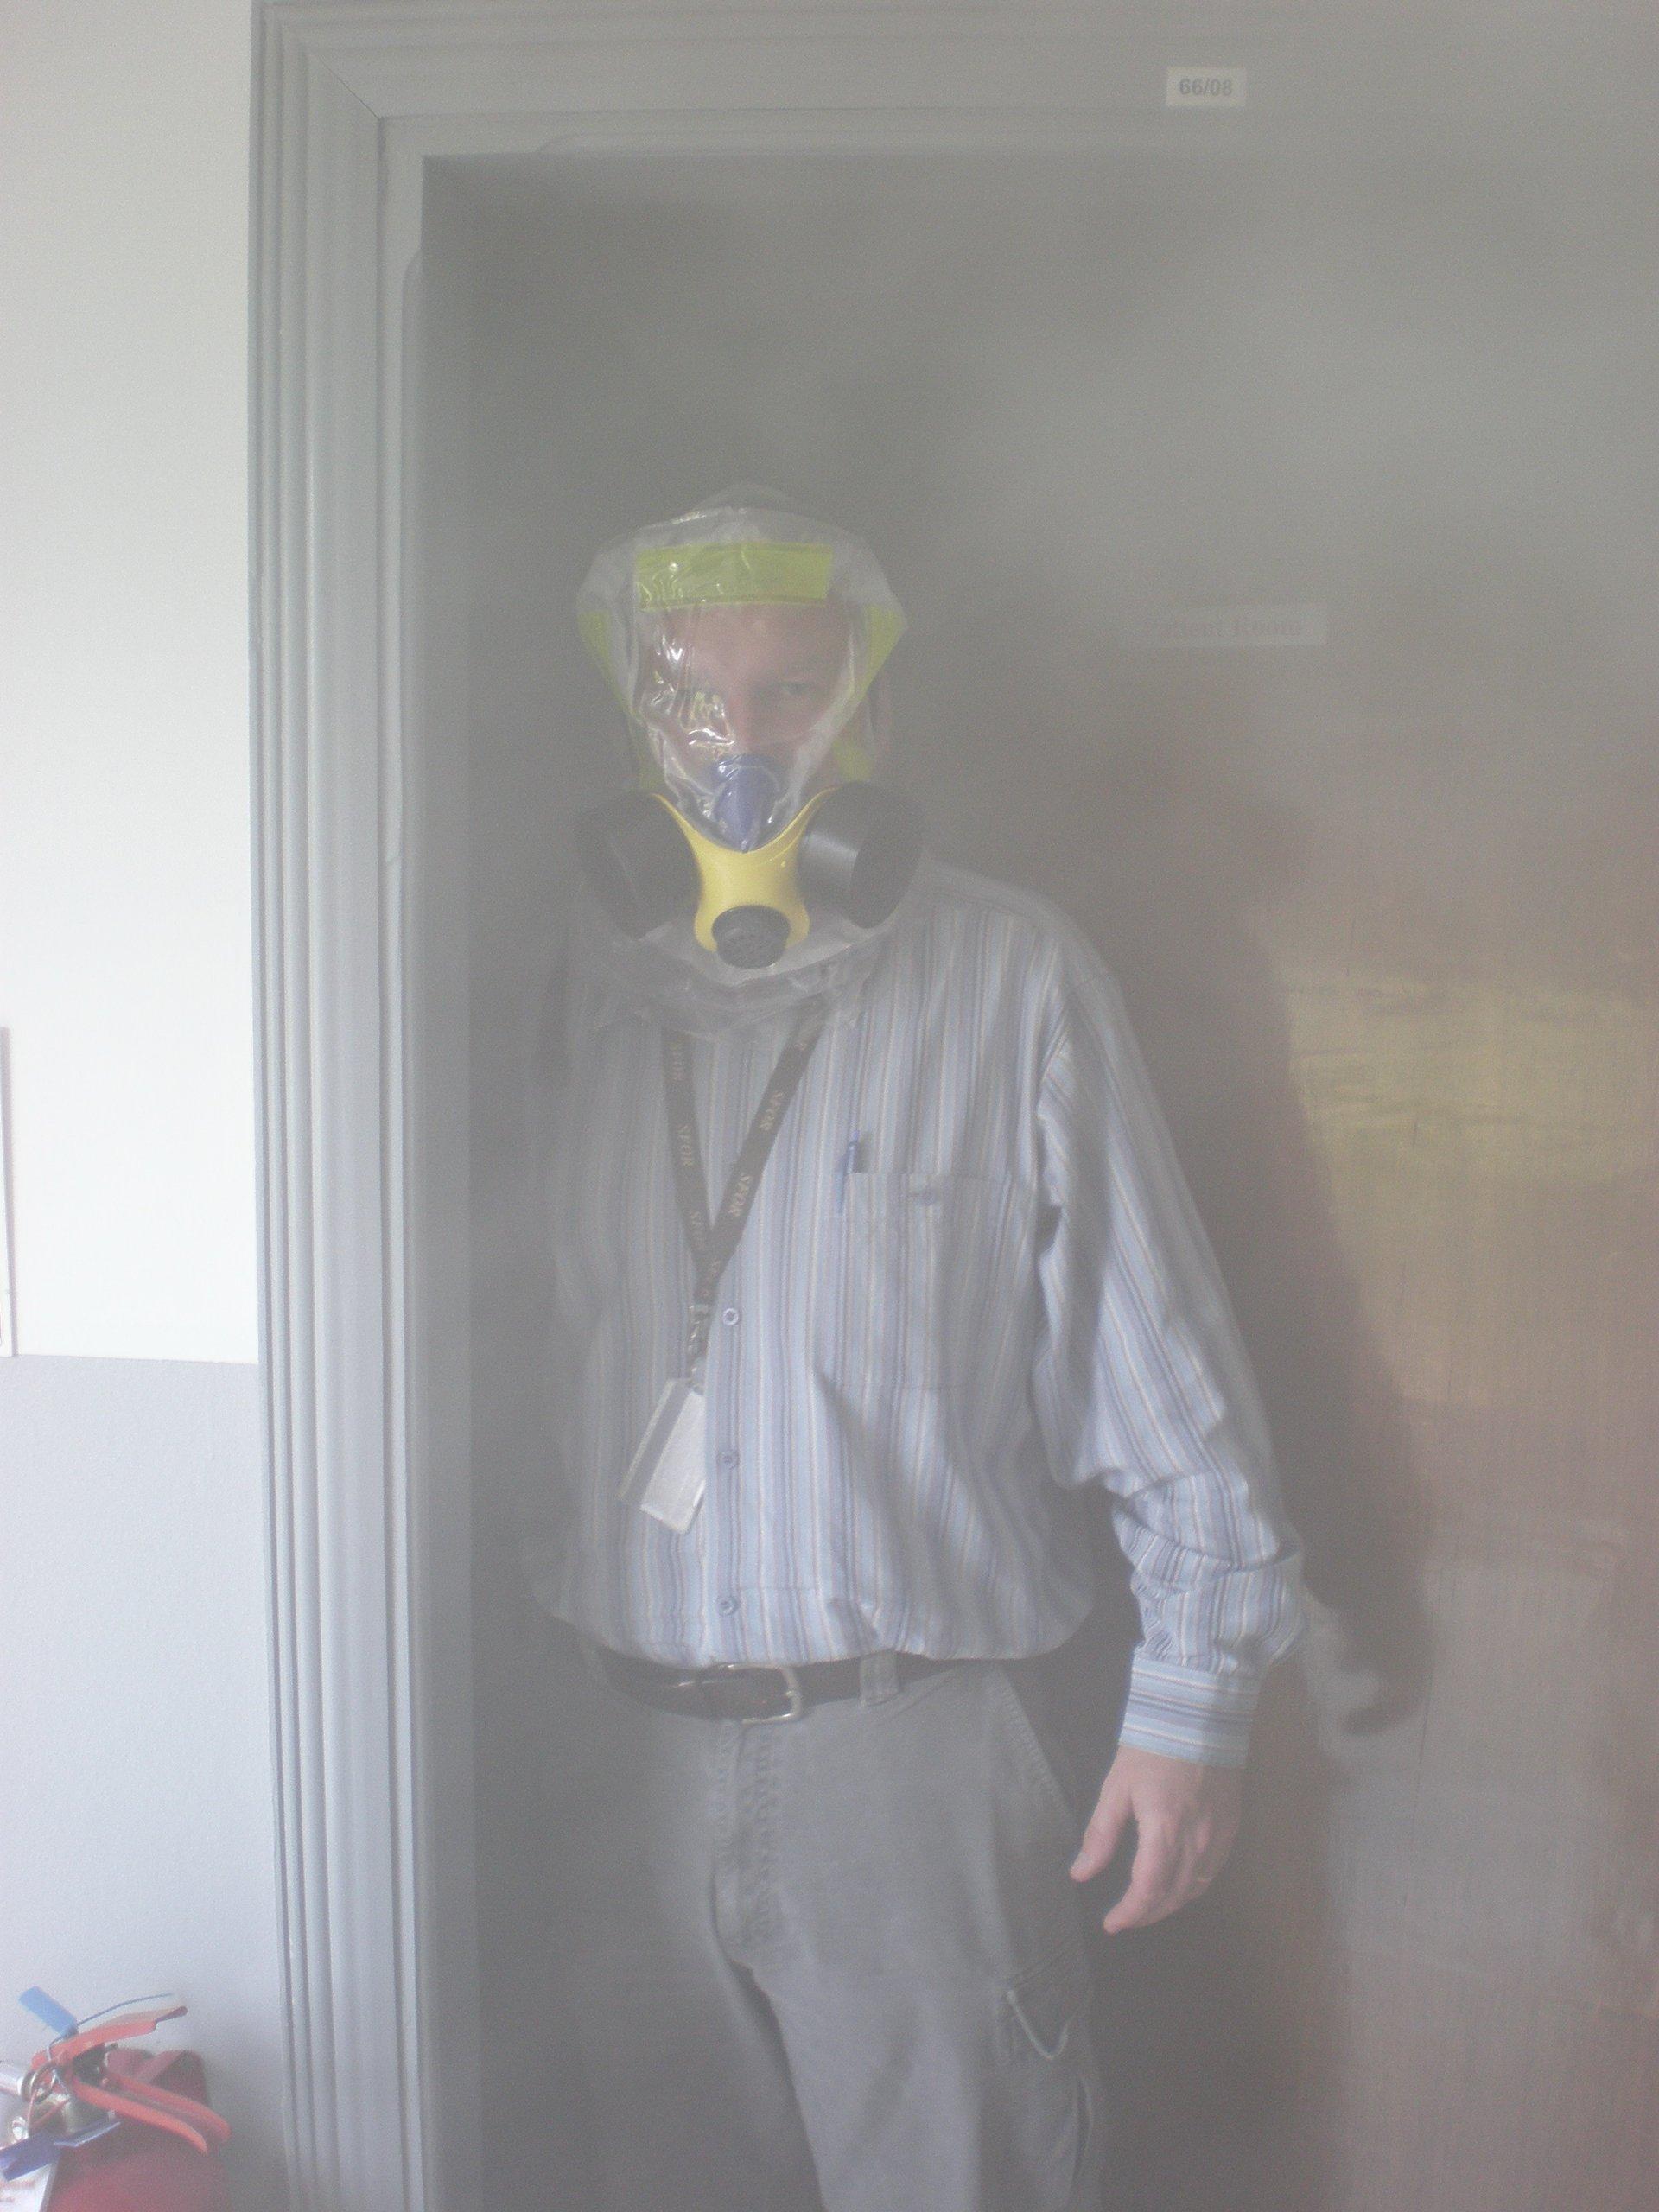 iEvac the only American Certified Smoke Hood/Fire Mask by Elmridge